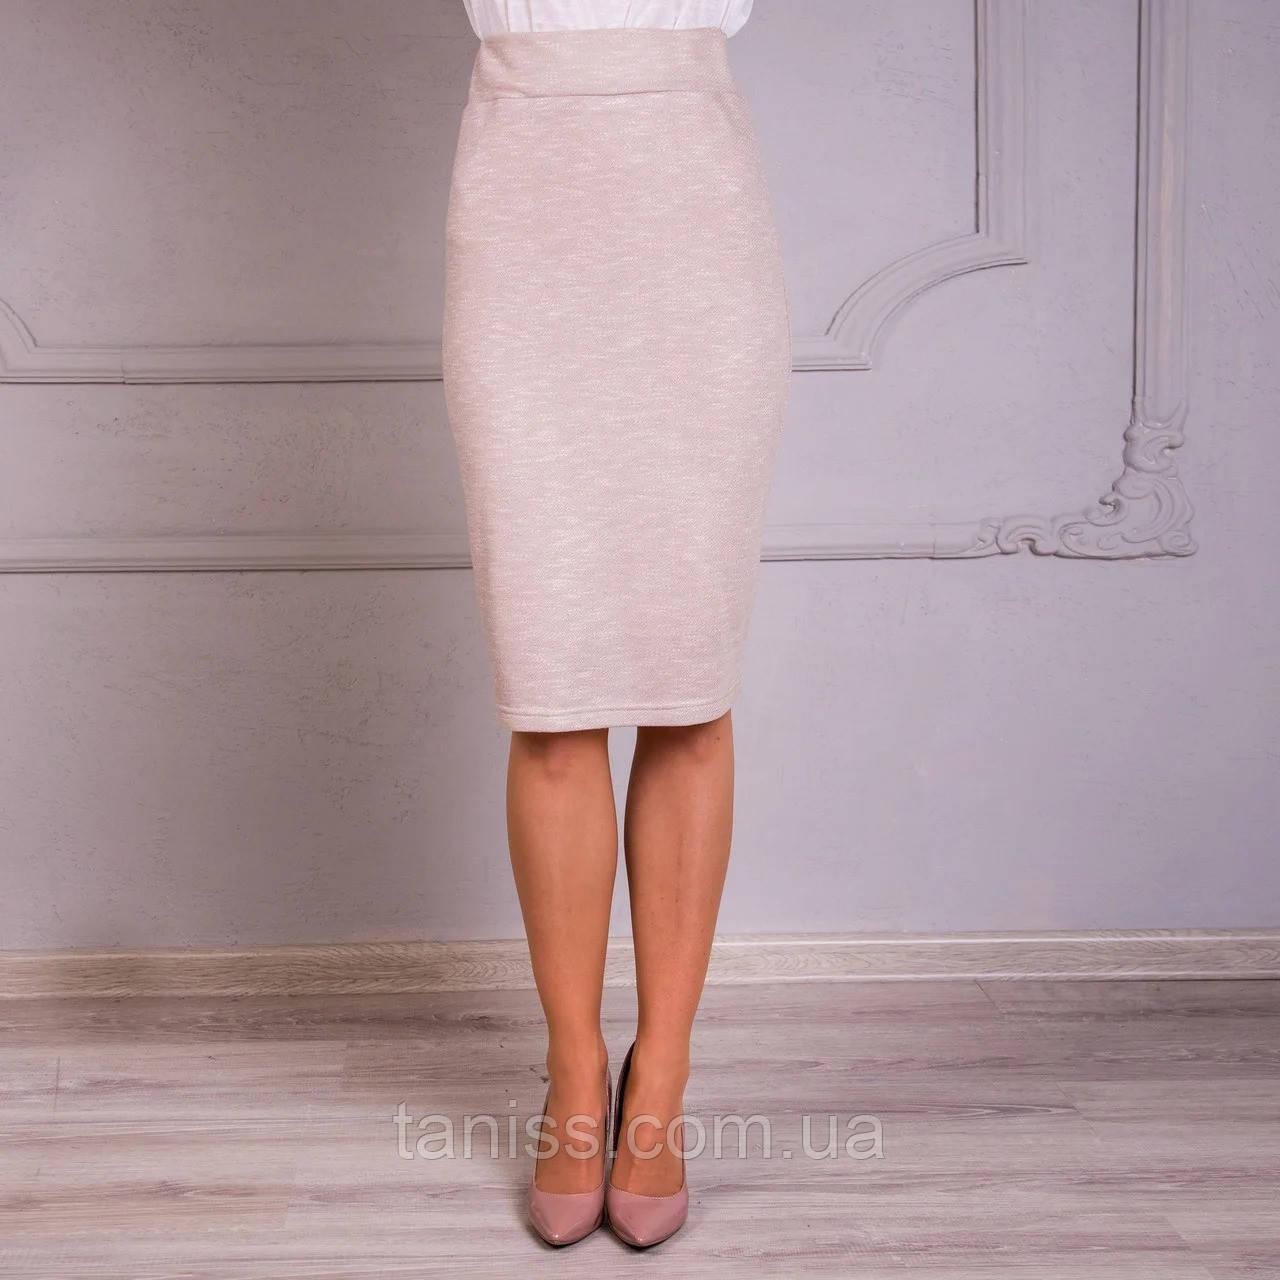 "Женская классическая юбка "" Афина "", ткань трикотаж  , р-р  44,64,48,50,52,54 , беж, спідниця"